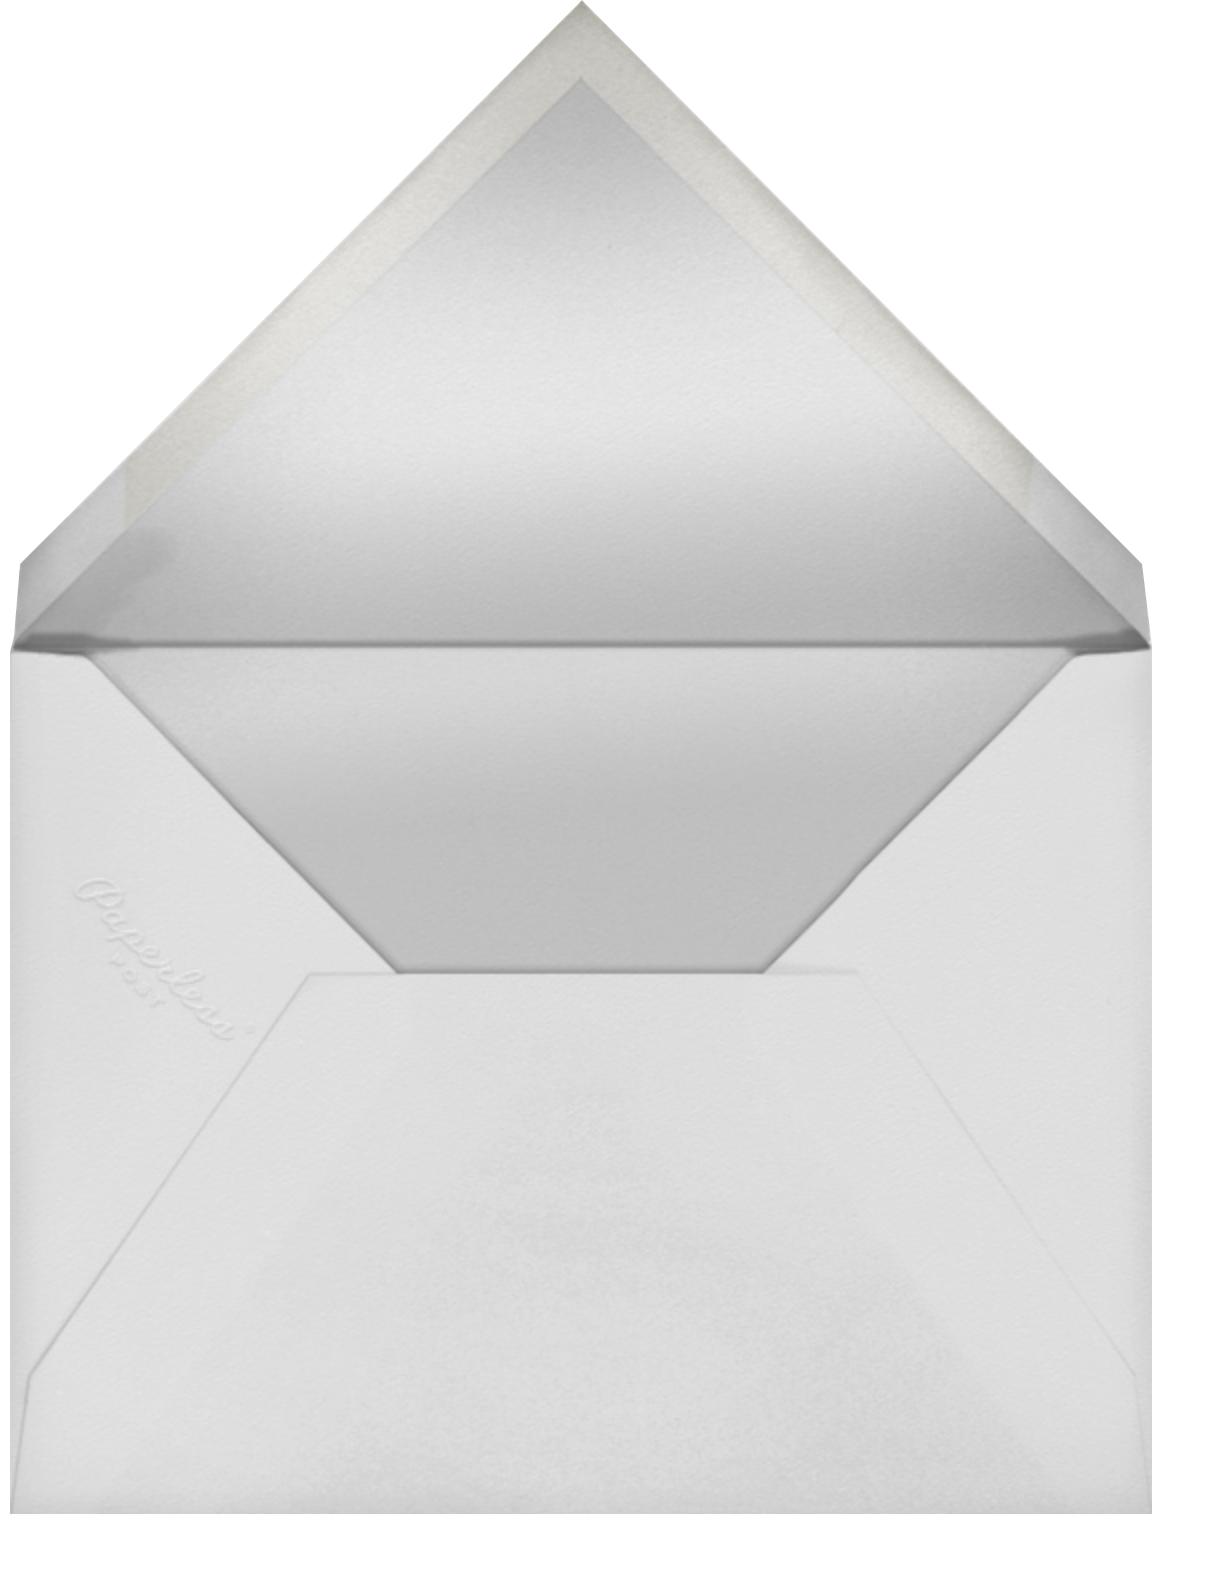 Gradient White Border - Pink - Paperless Post - Adult birthday - envelope back